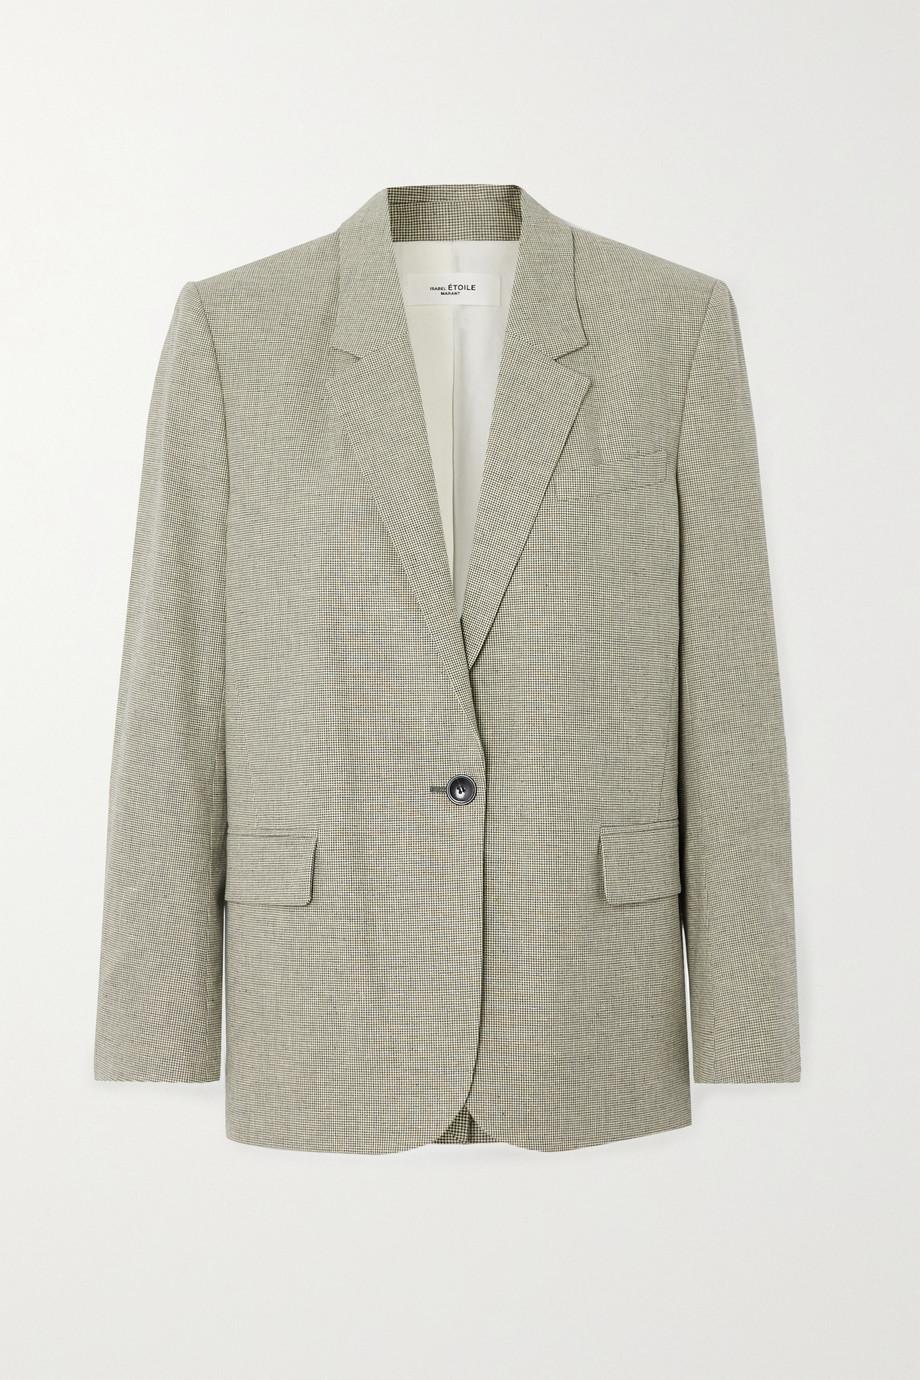 Isabel Marant Étoile Verix checked cotton and linen-blend blazer